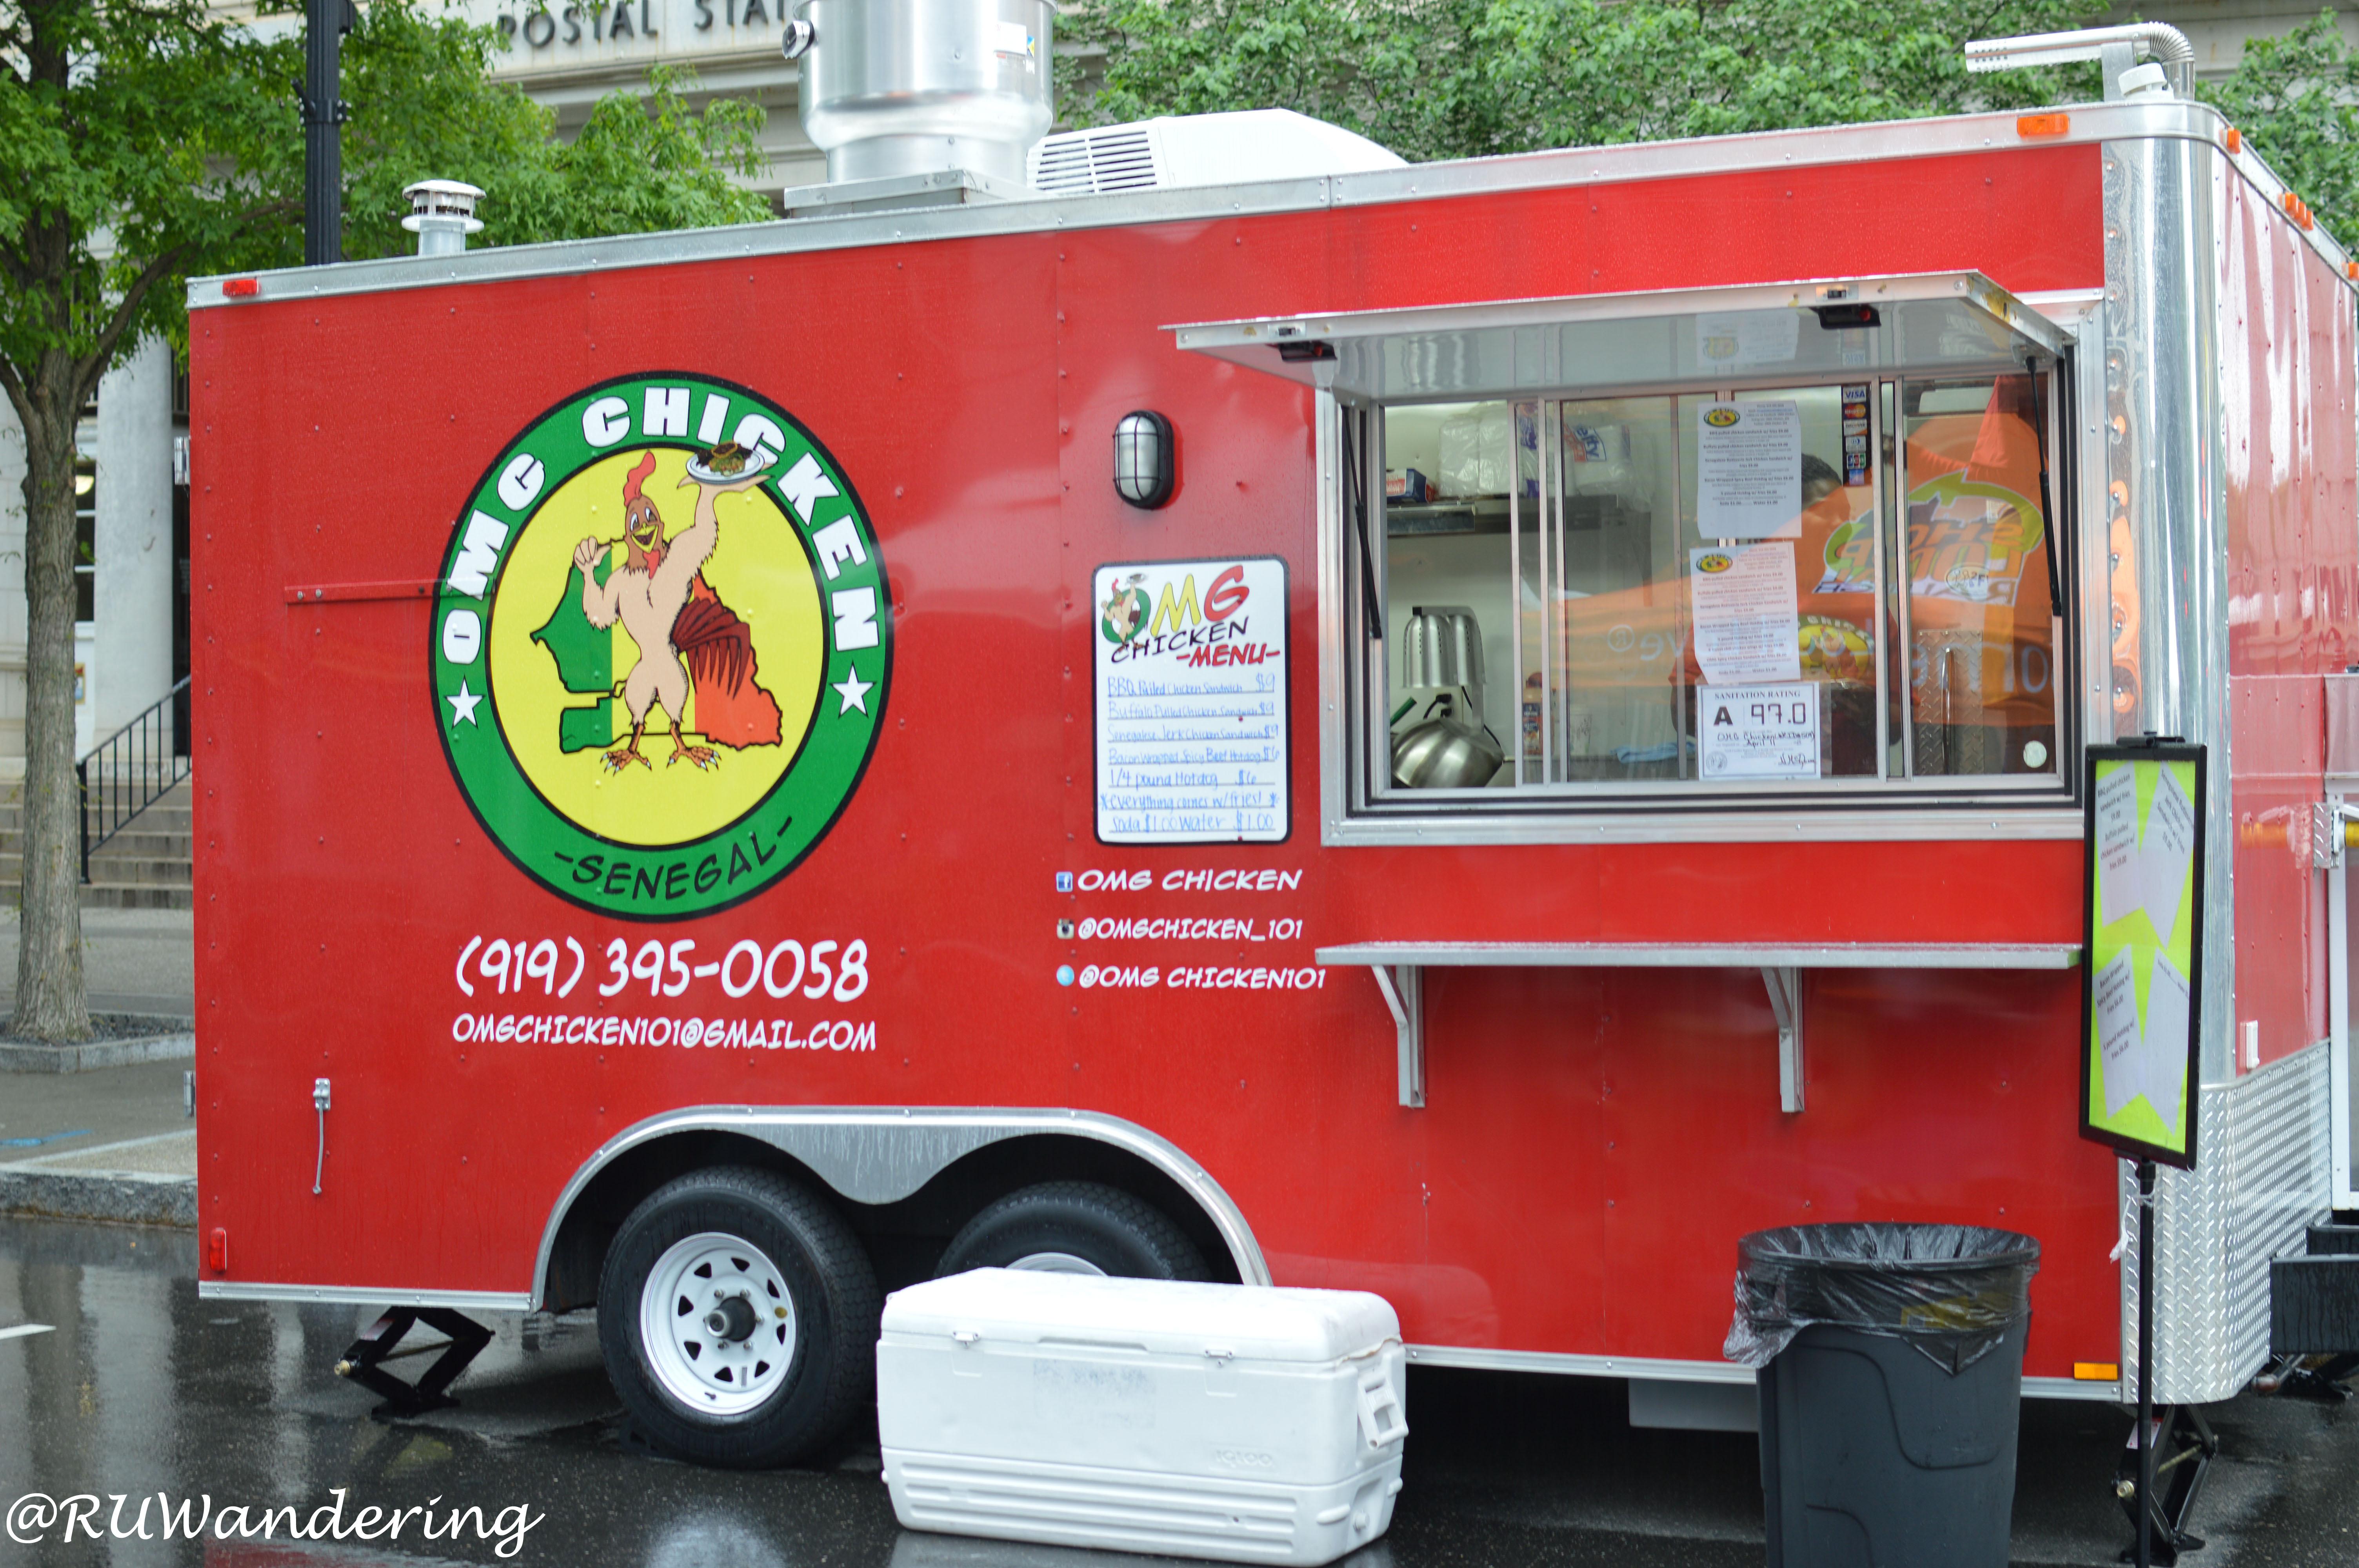 June 22nd New Food Truck Radar The Wandering Sheppard